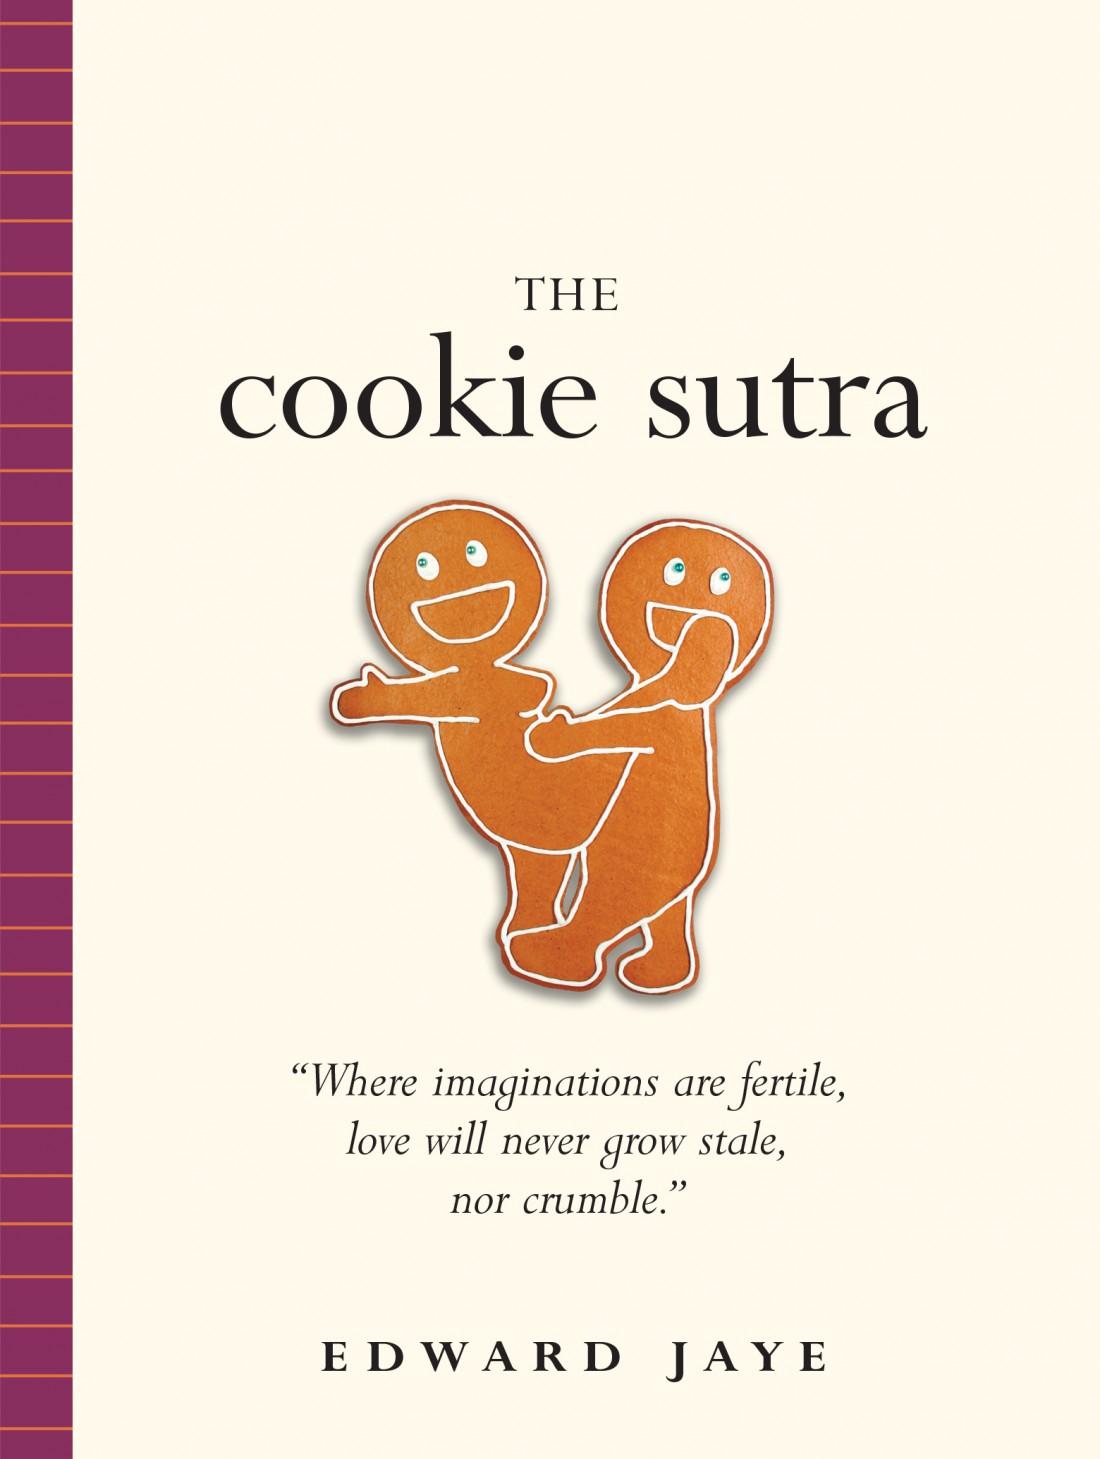 Книга The Cookie Sutra, Эдвард Джейн, $7.96